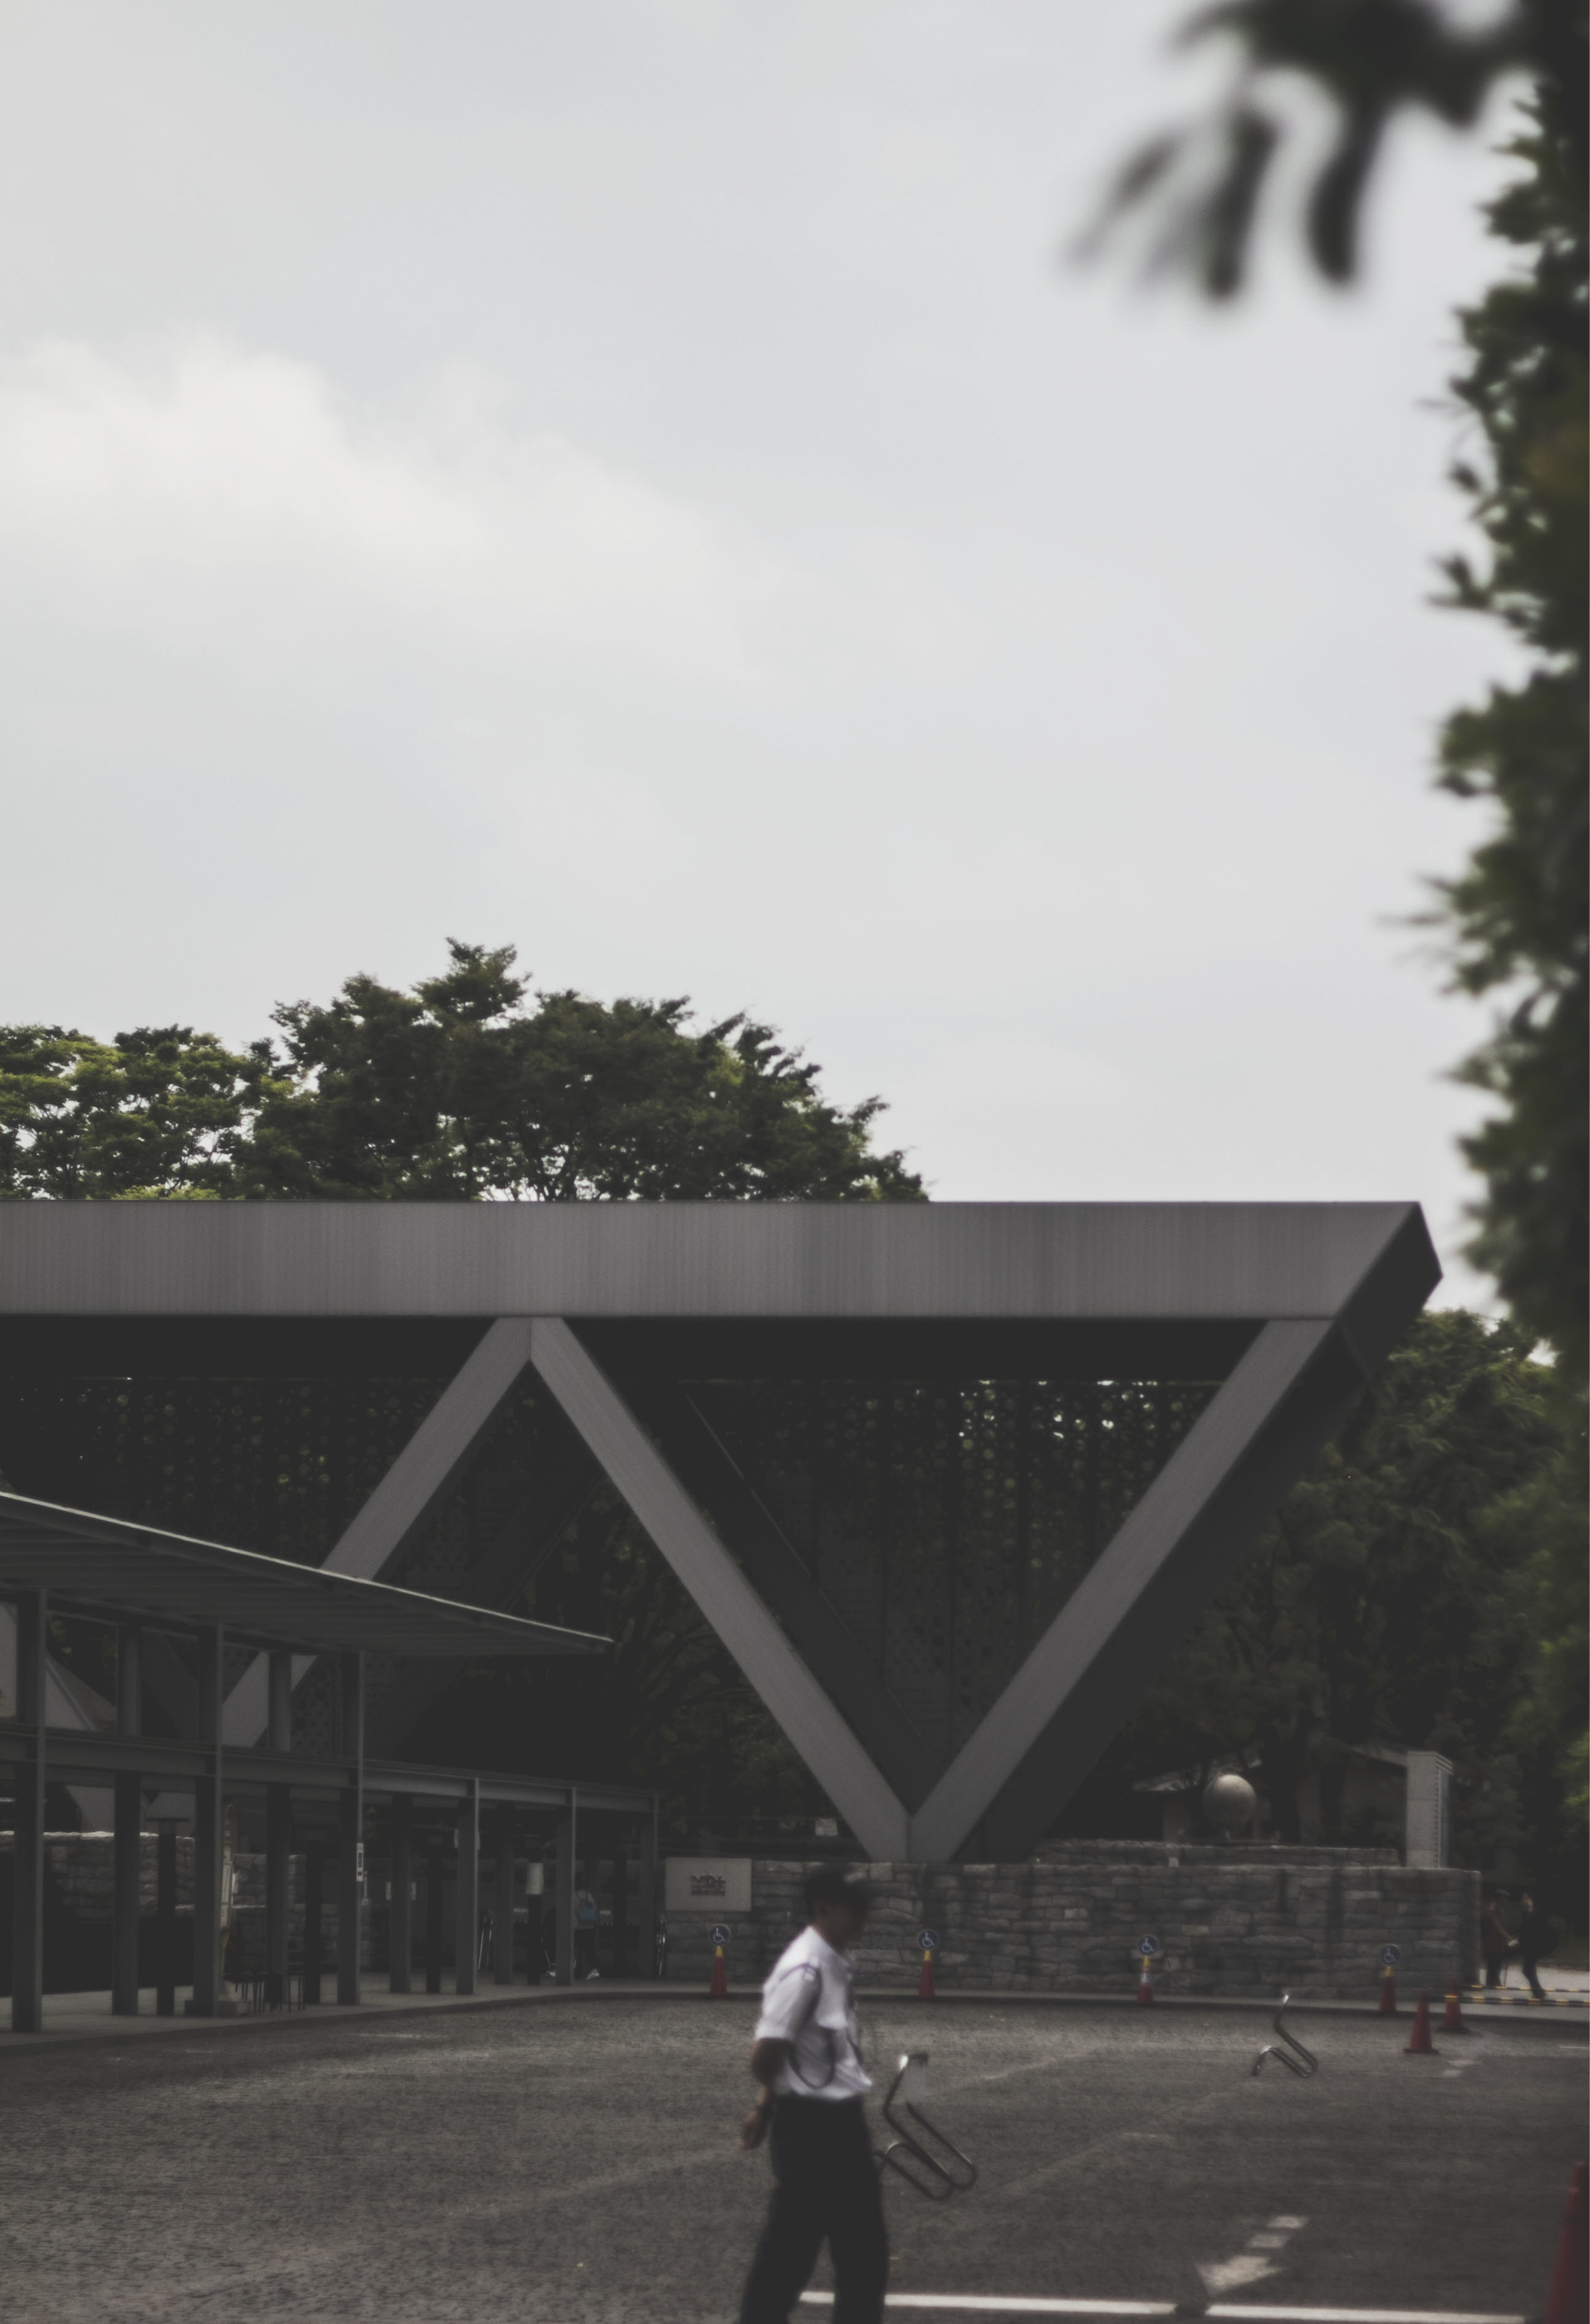 Museum of Contemporary Art Tokyo - designed by Yanagisawa Takhiko